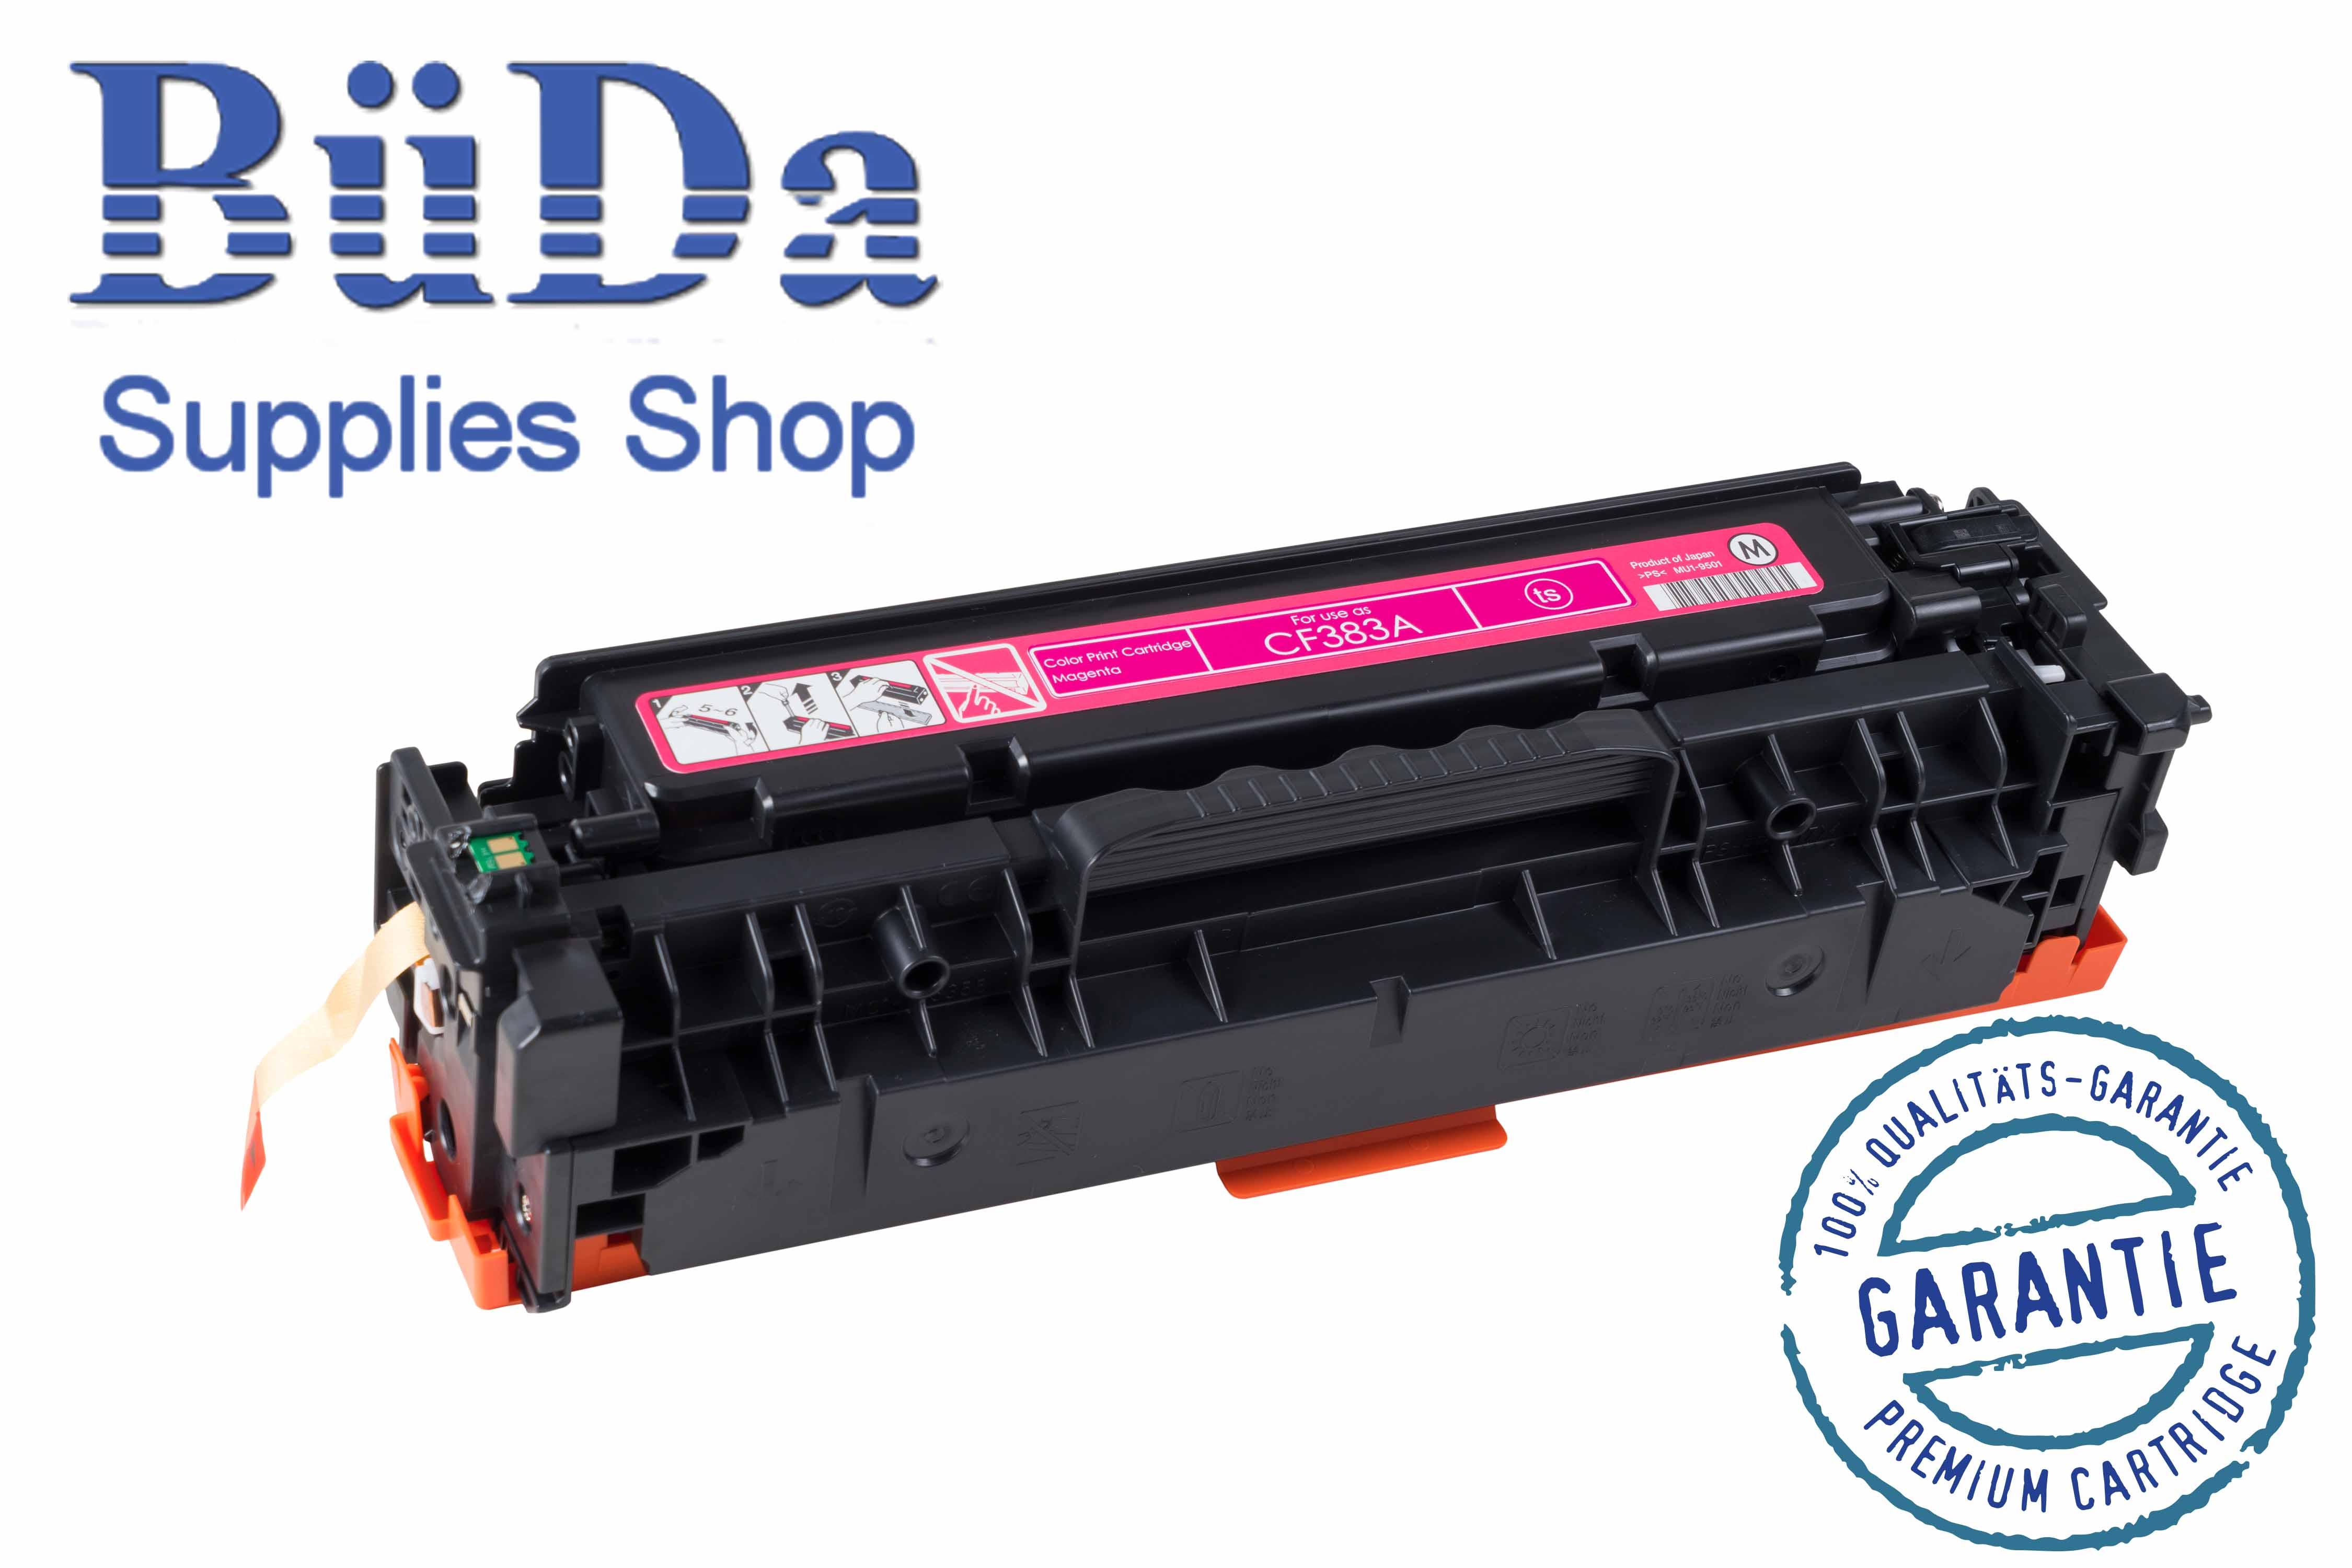 Toner-Modul komp. zu CF383A / 312A magenta 2700 Seiten